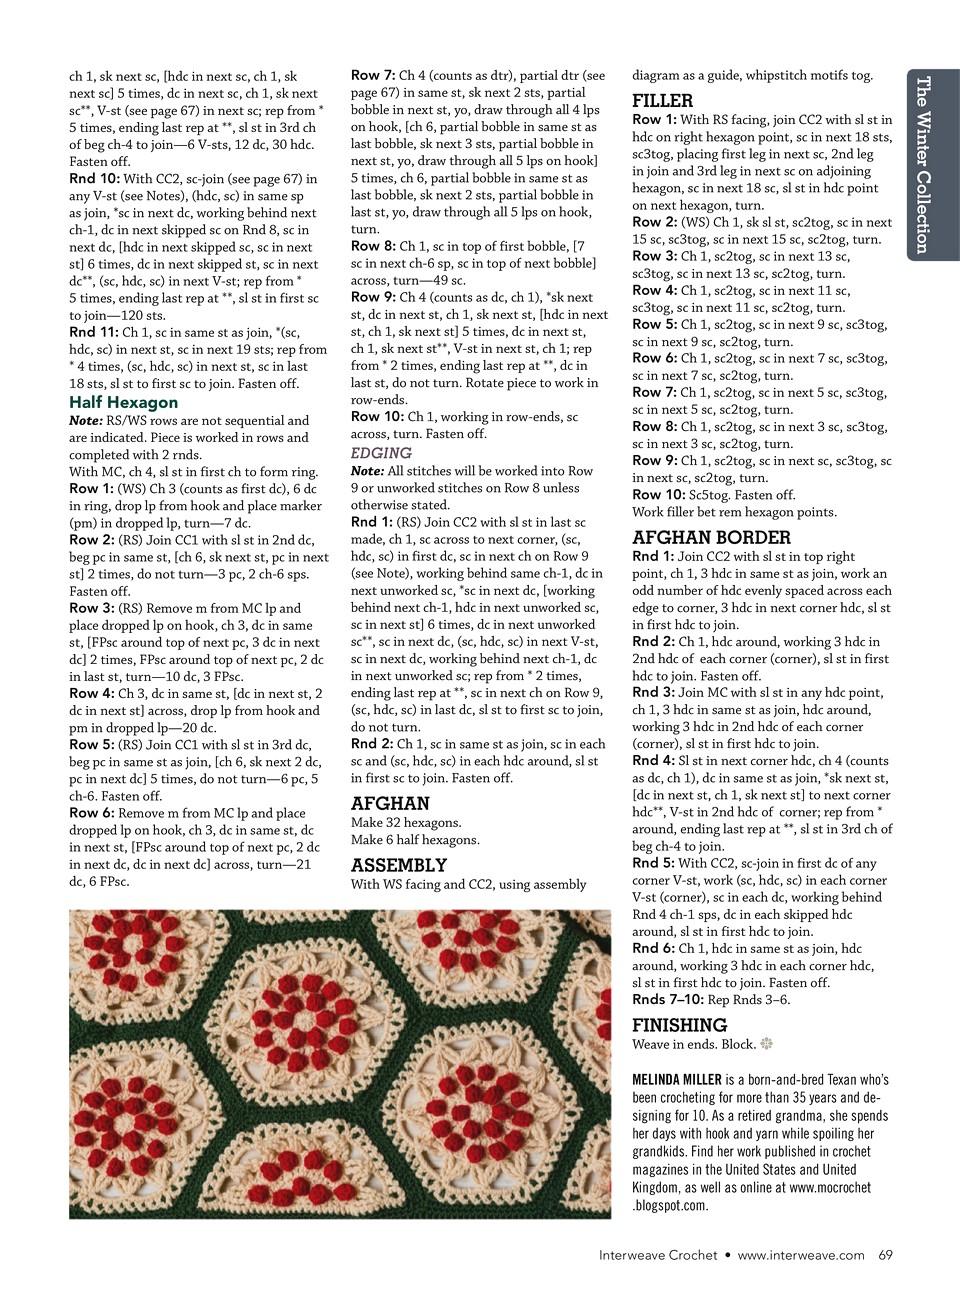 Interweave Crochet Winter 2019-70